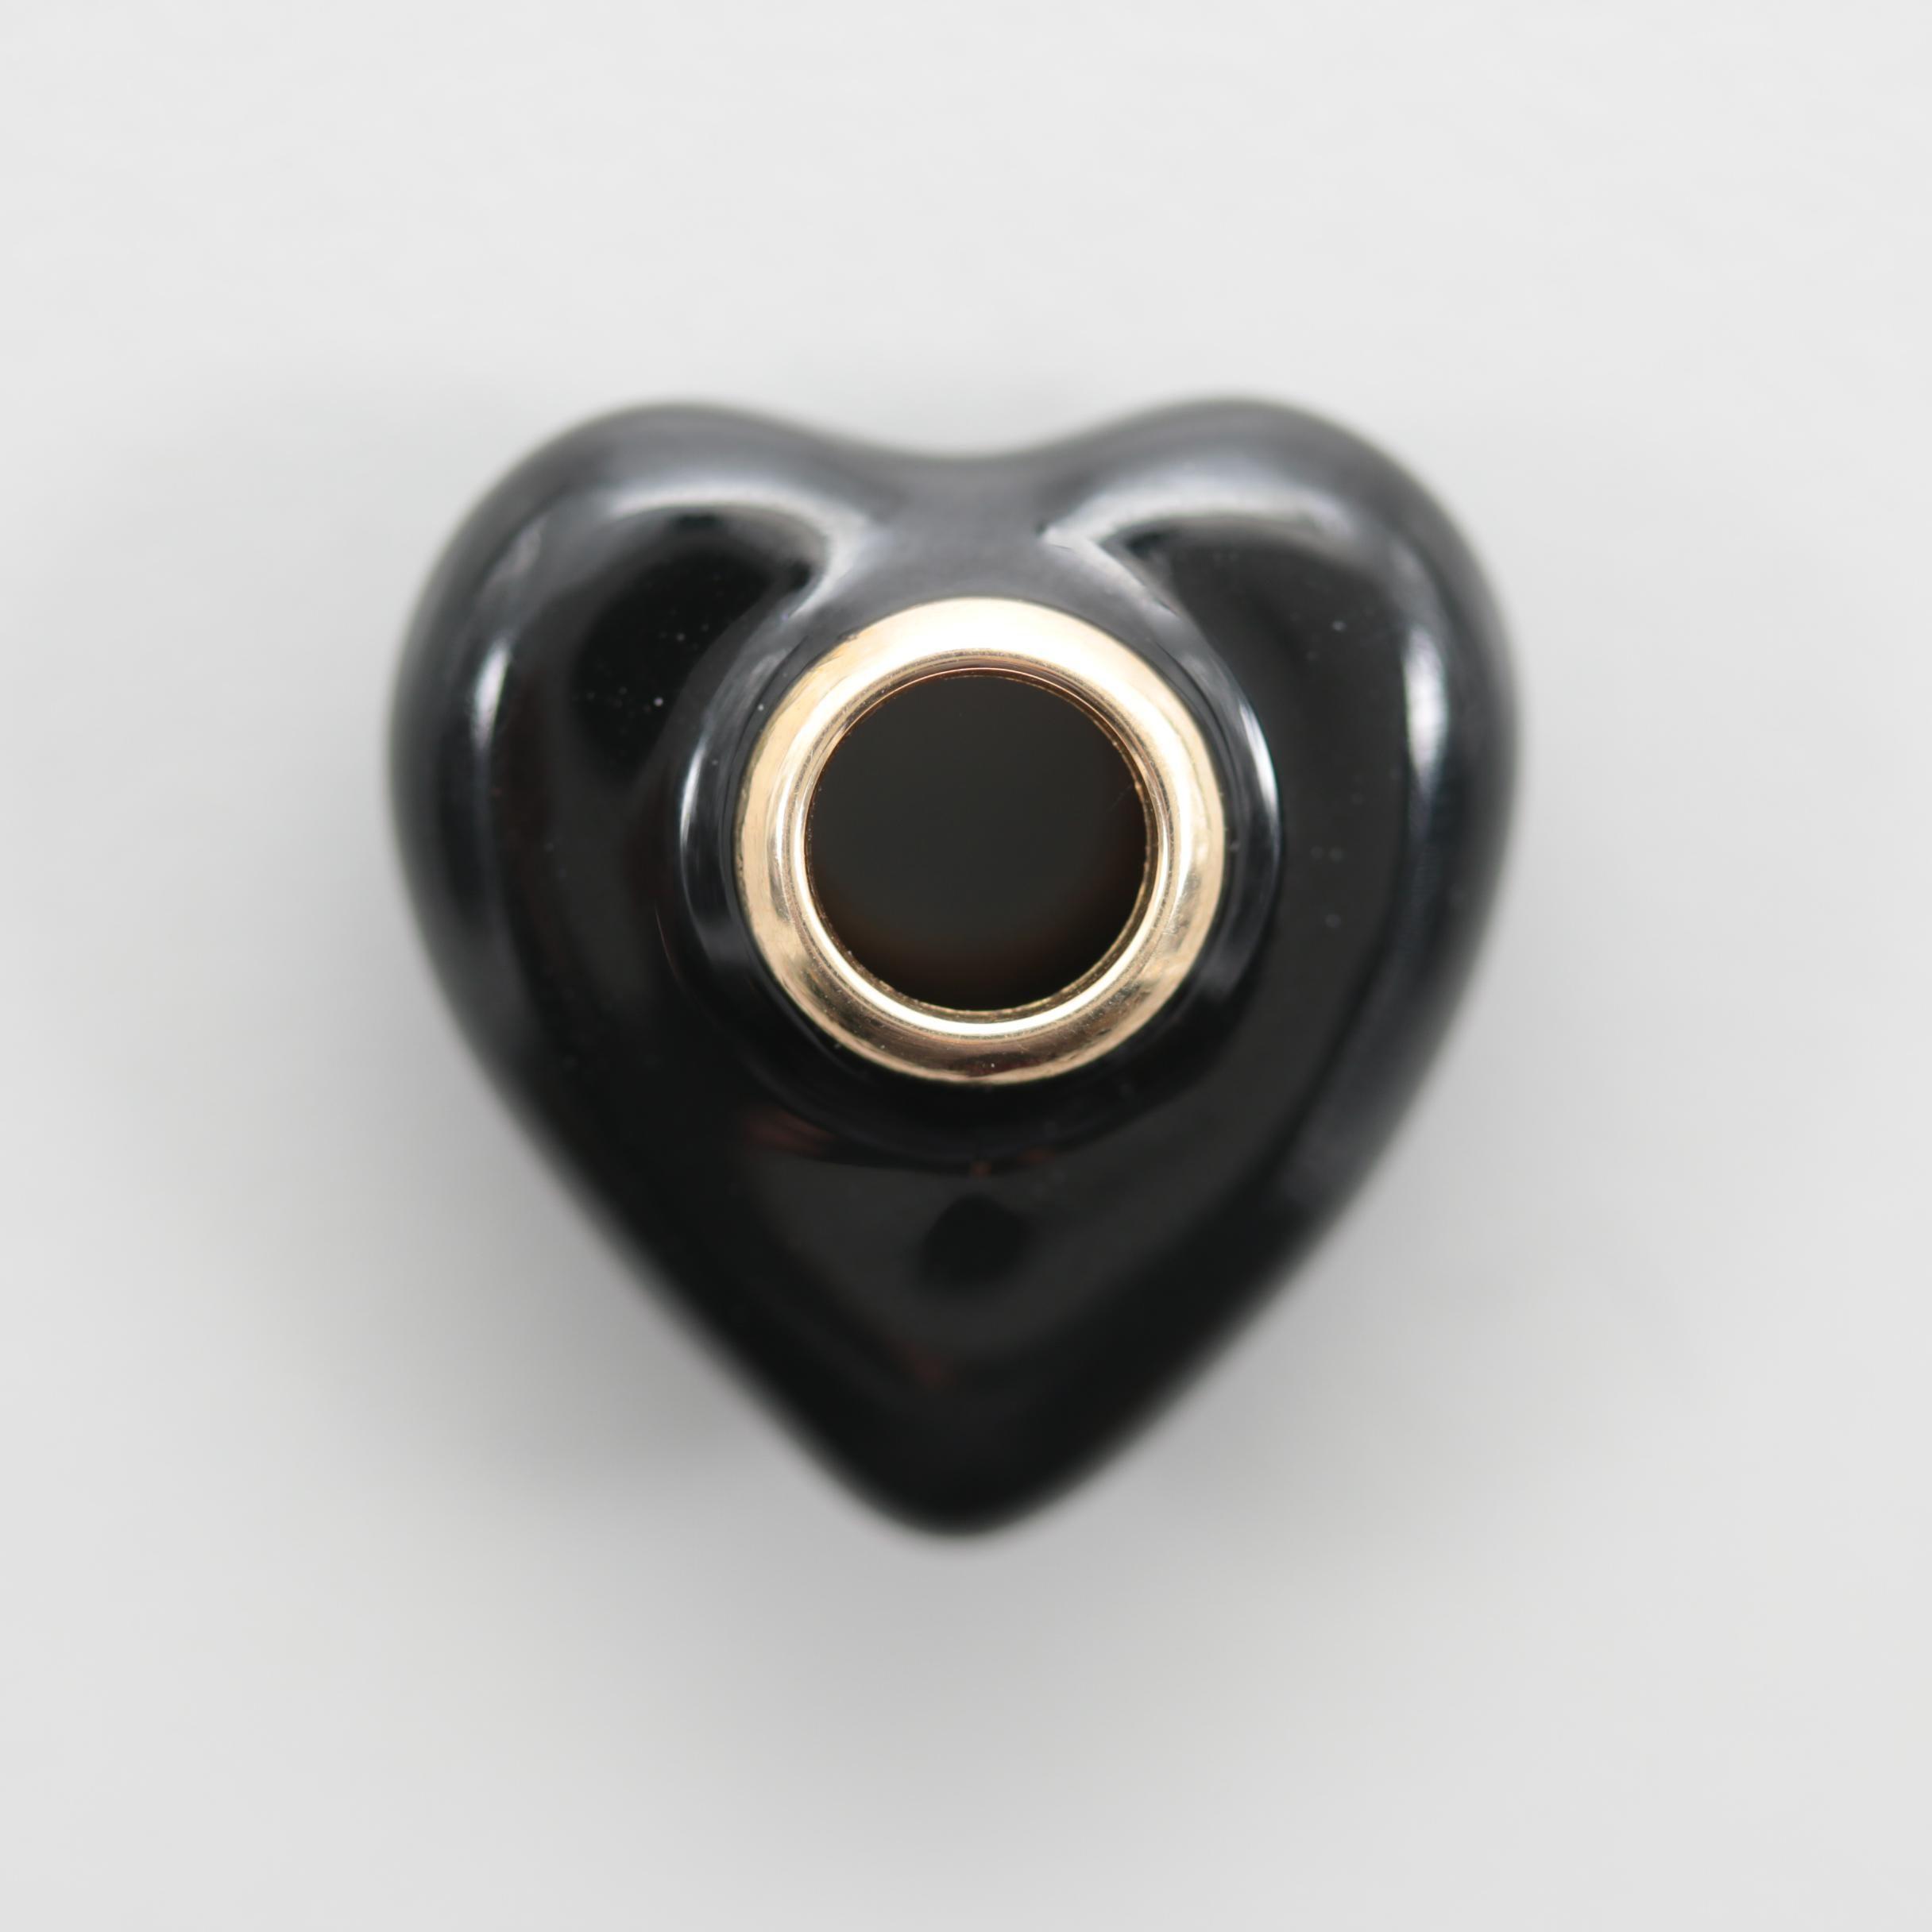 14K Yellow Gold Resin Heart Pendant